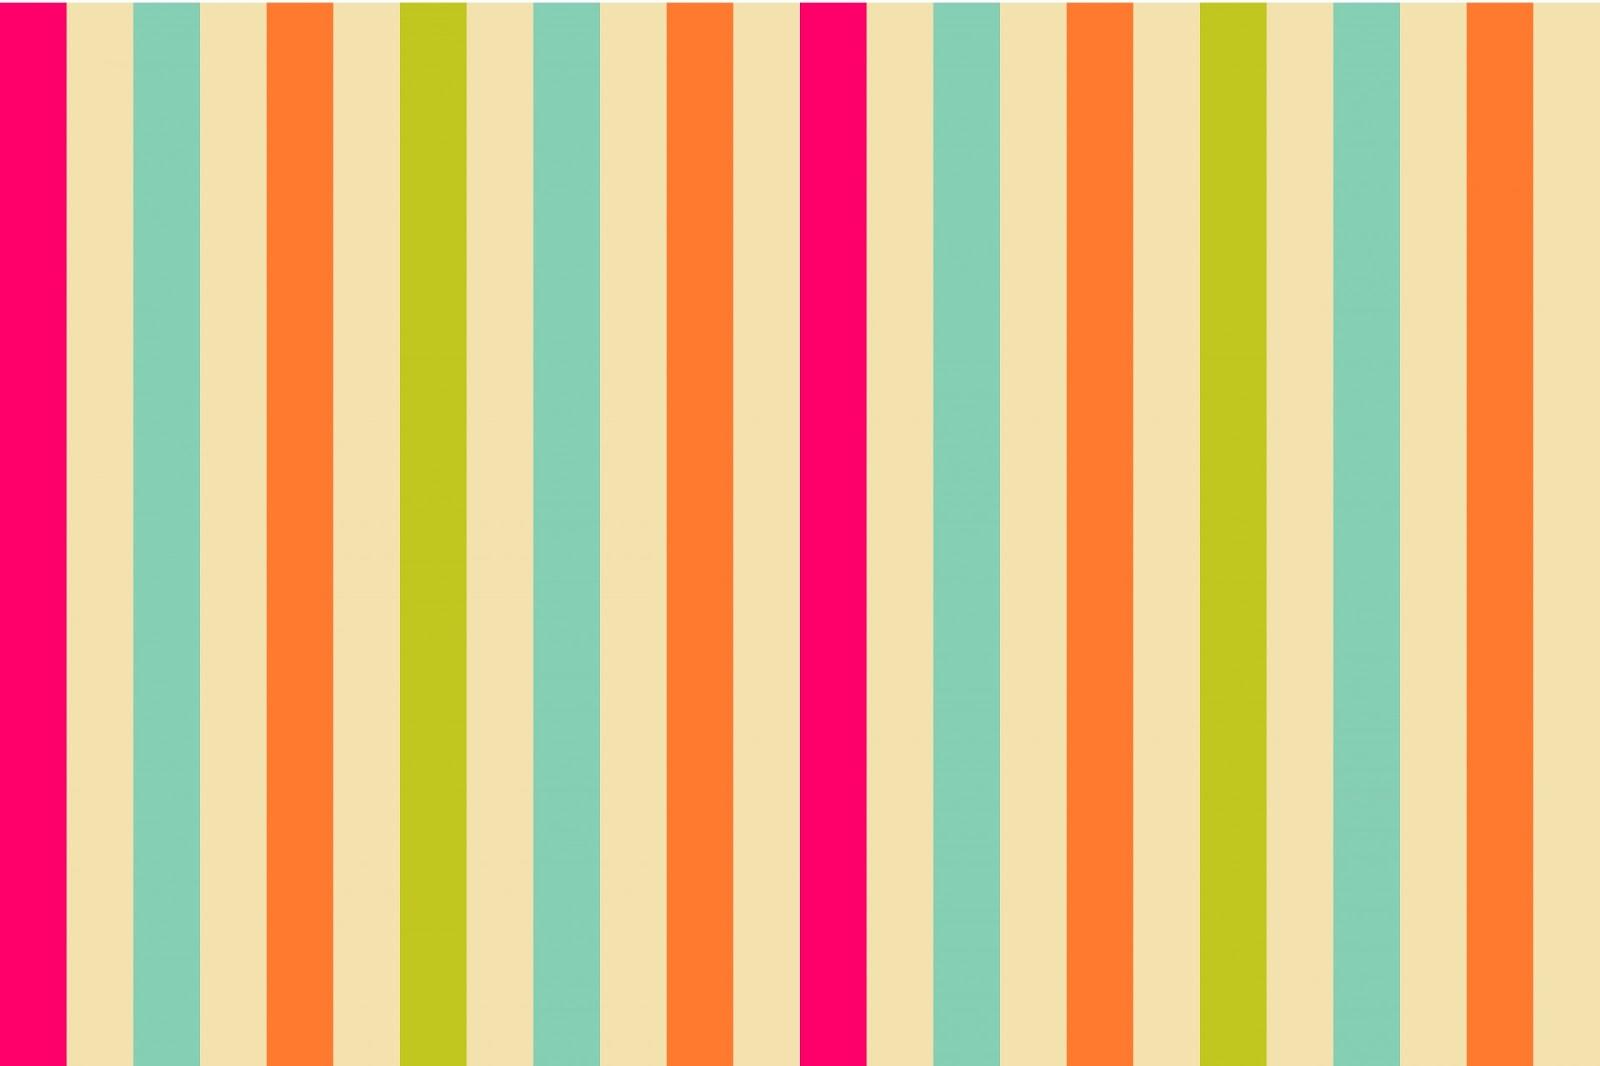 Pattern Wallpapers Dekstop Hd Wallpapers